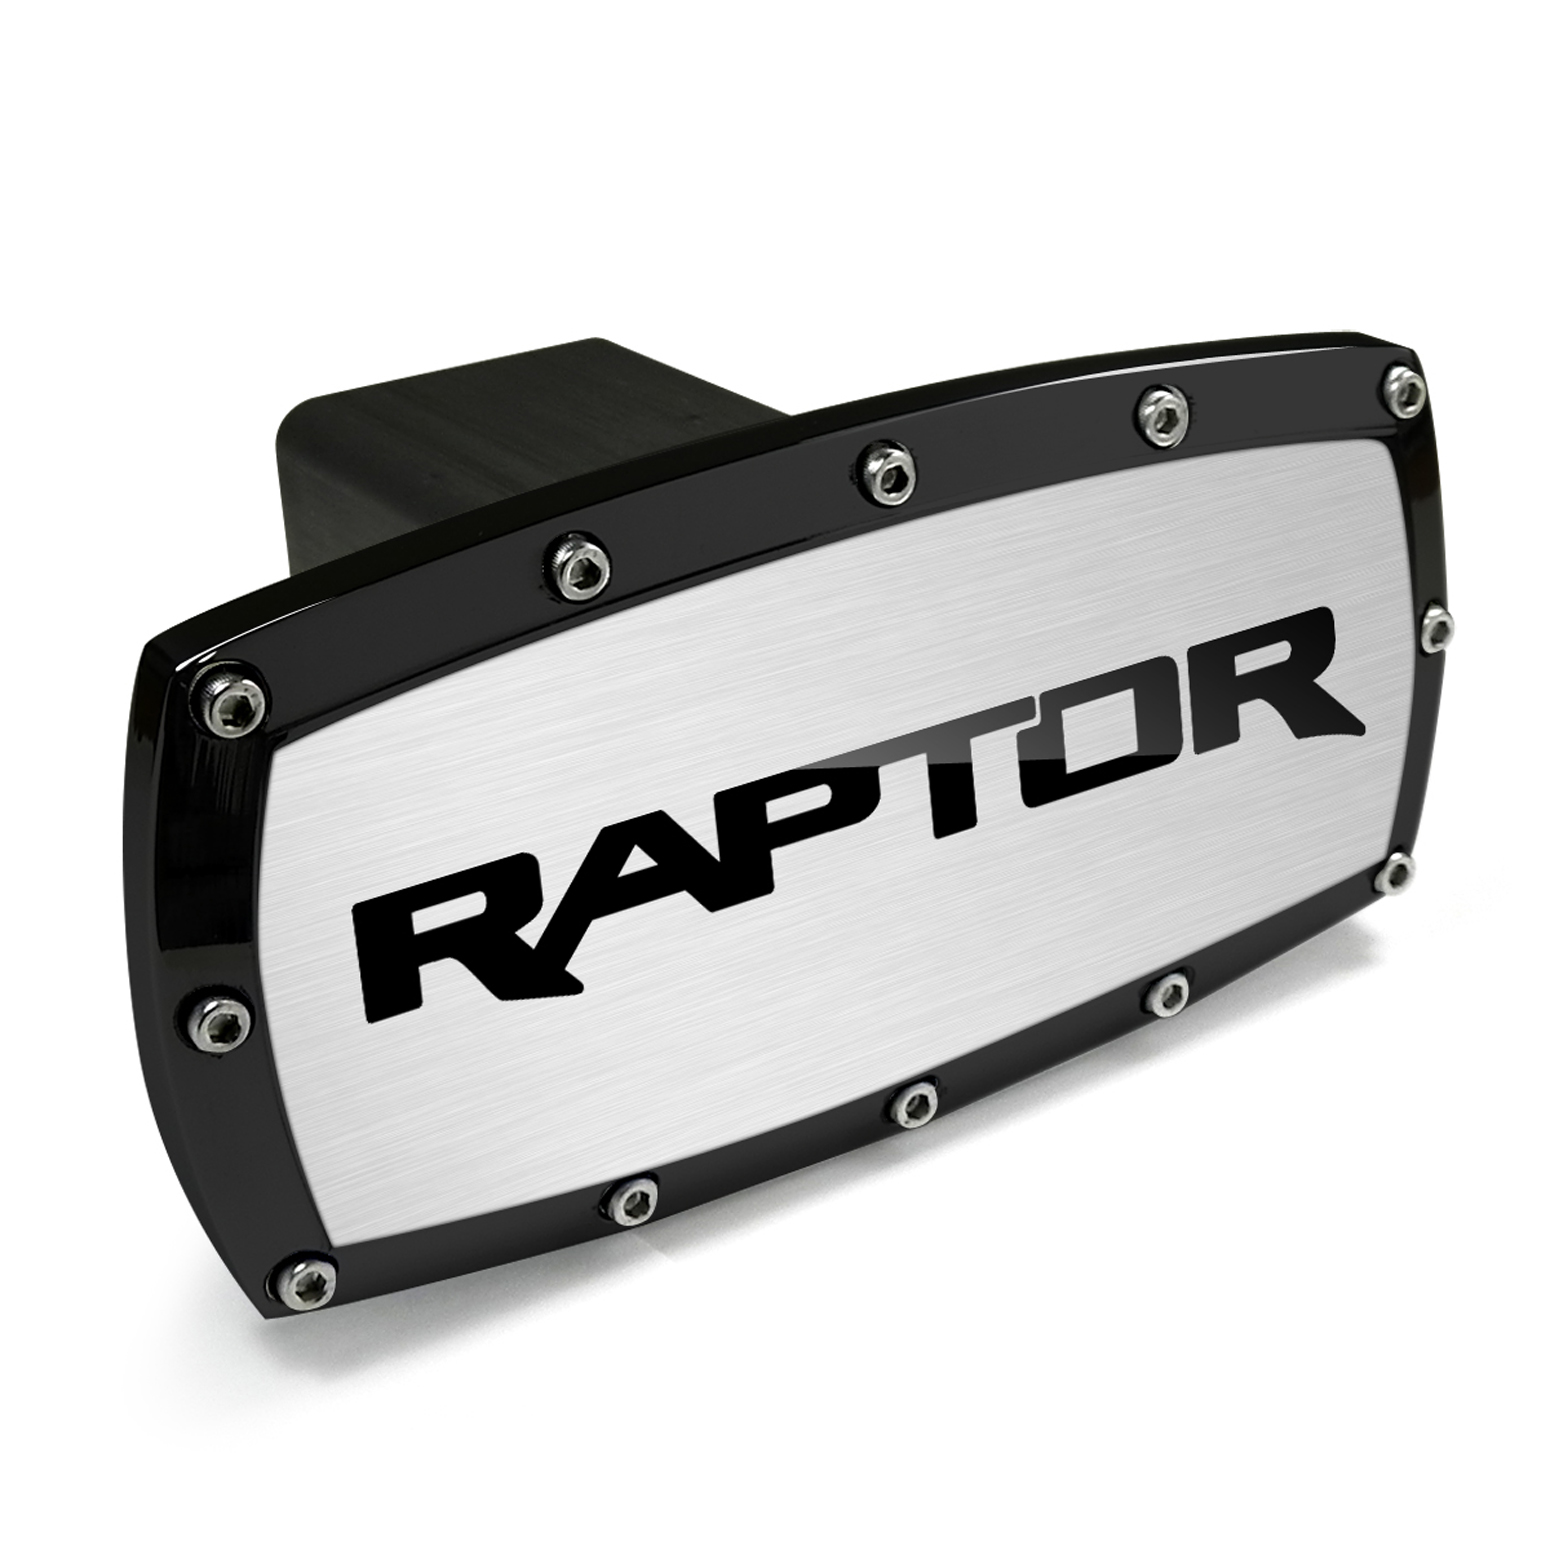 Ford F-150 Raptor Black Trim Billet Aluminum Tow Hitch Cover